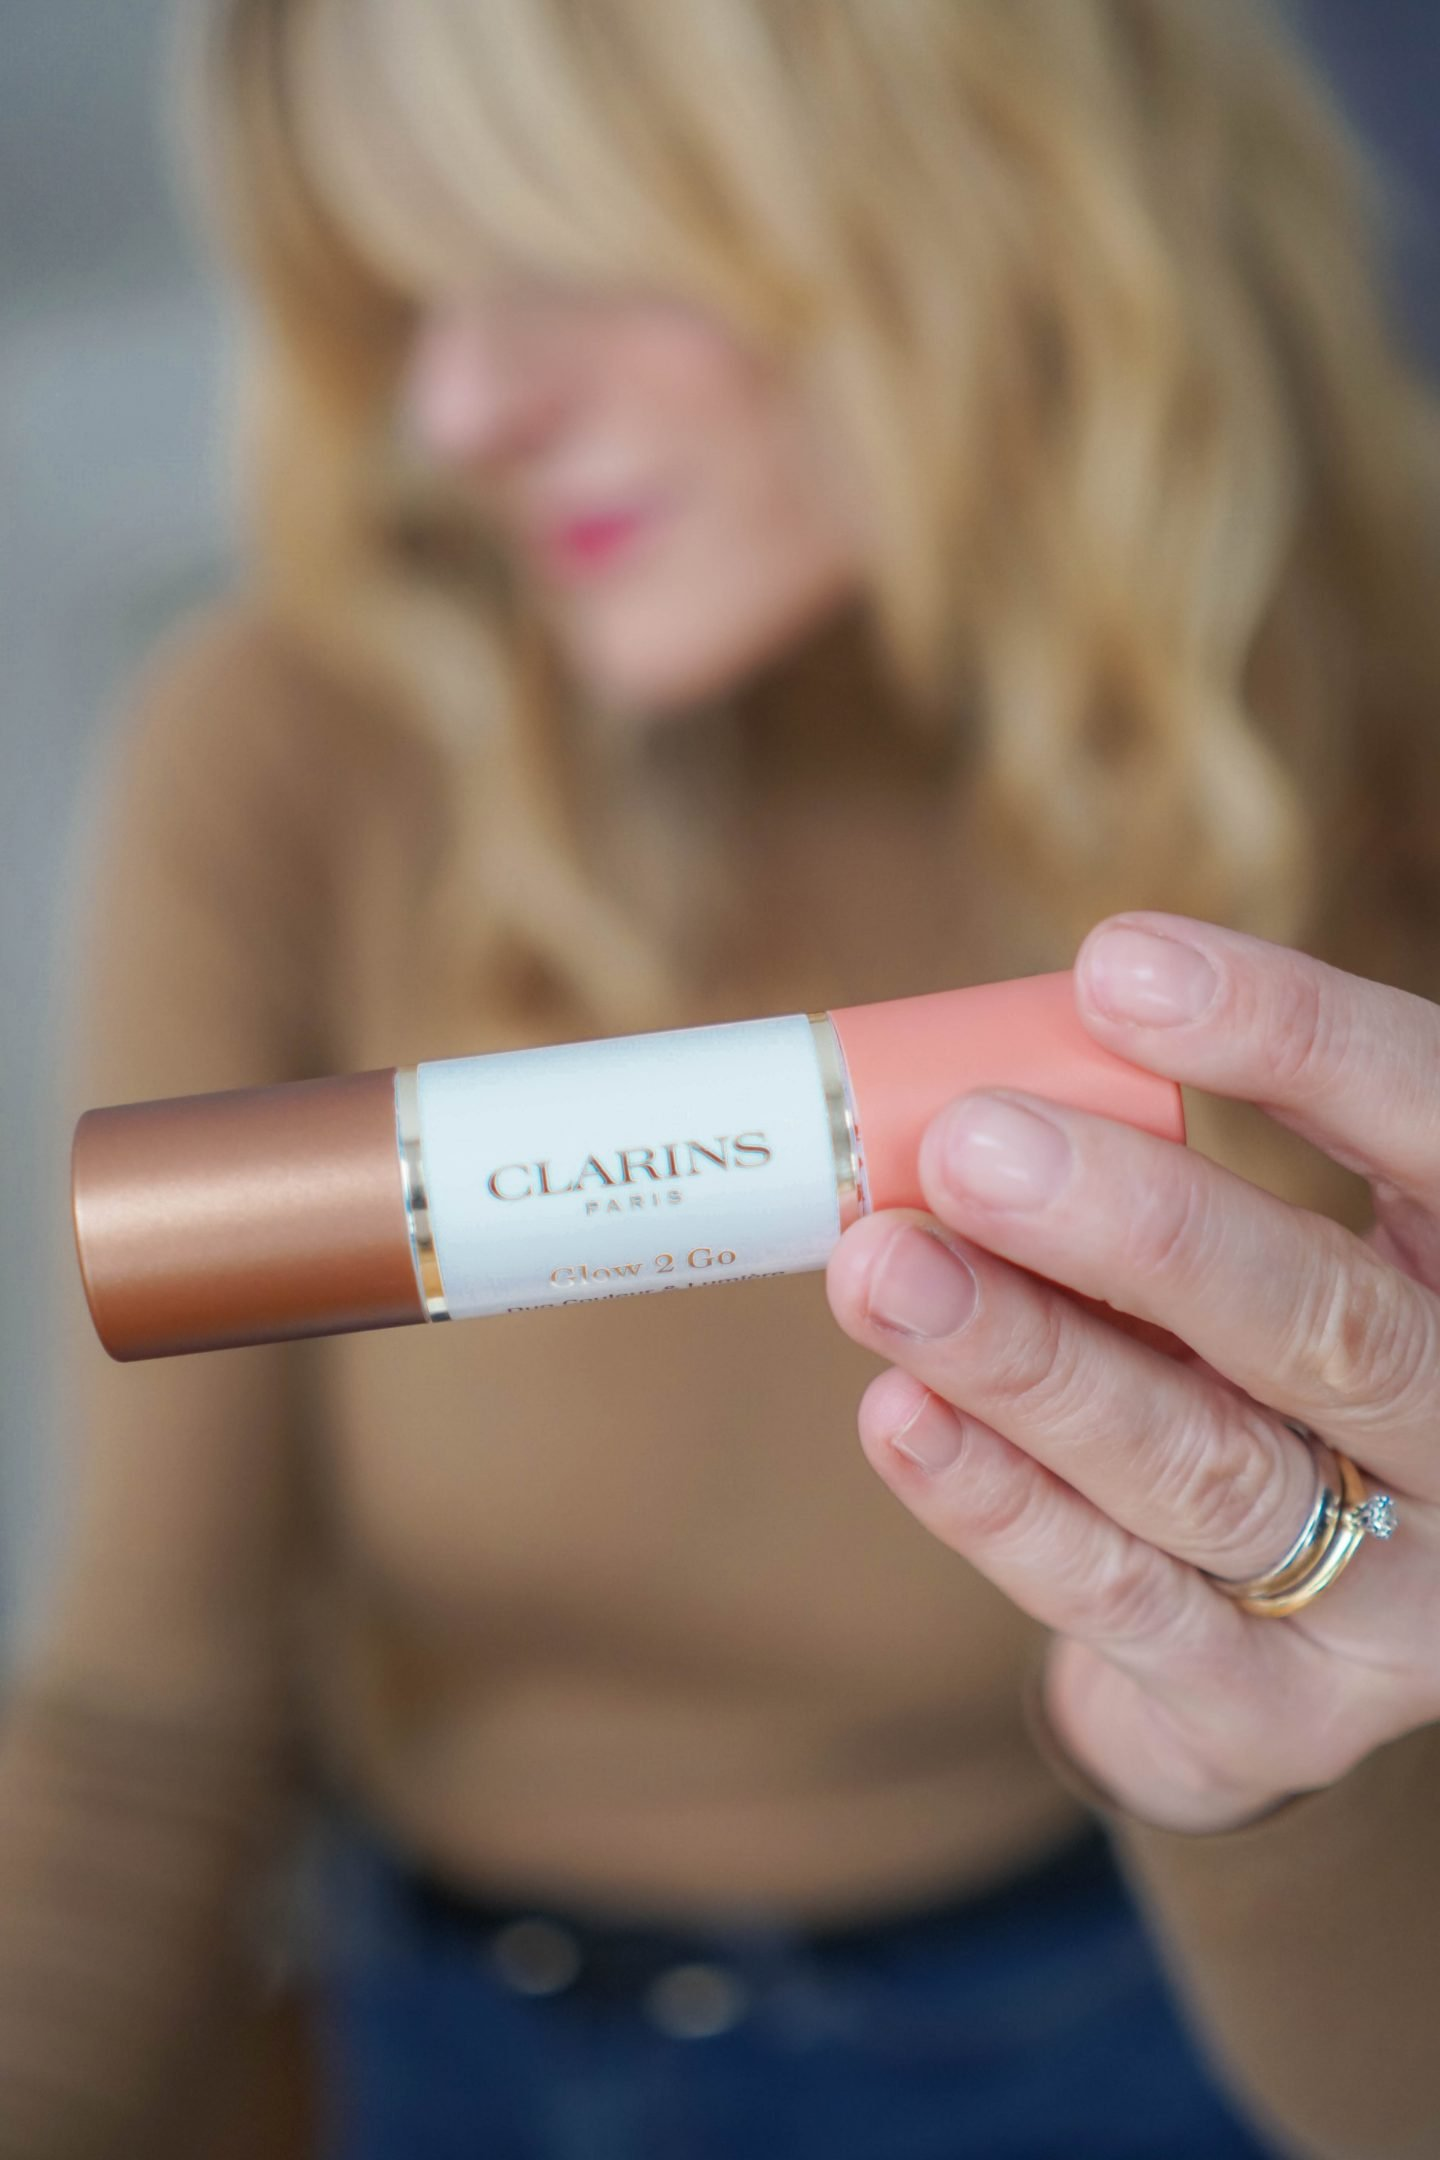 Glowy Skin-Soft Contour-Clarins Glow to Go Review-Makeup Tutorial-Nowshine Beauty Blog